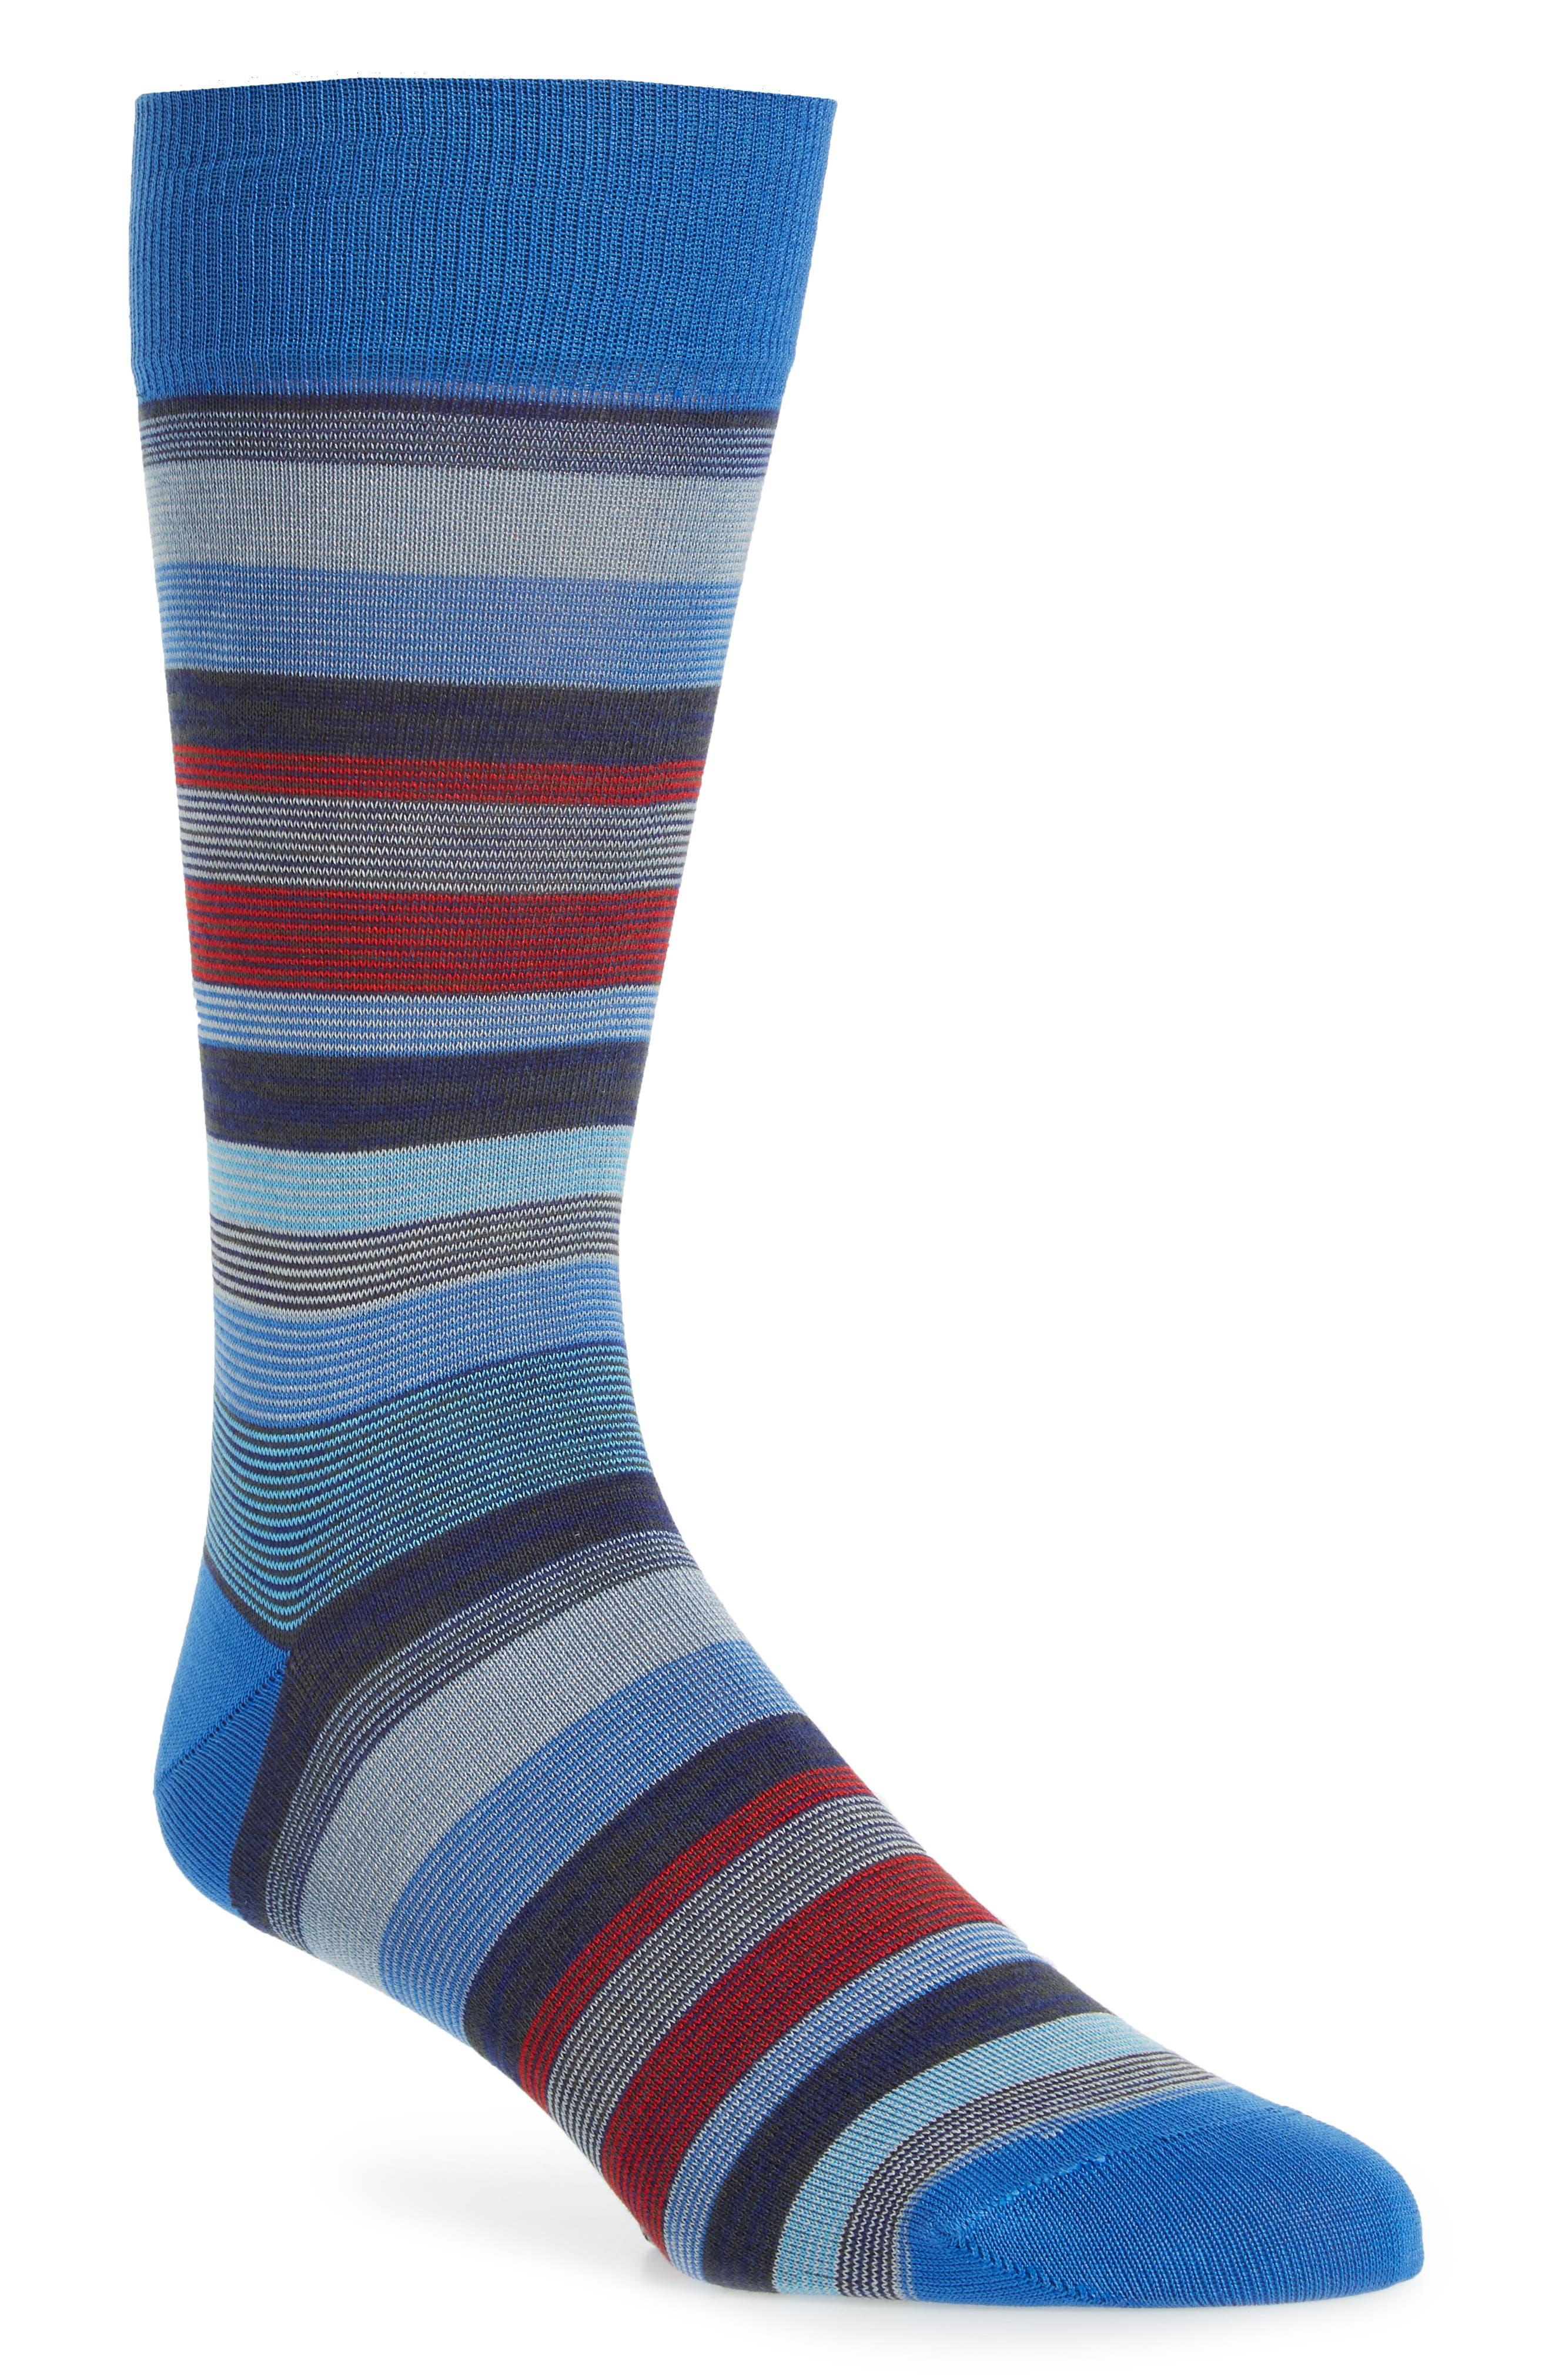 Stripe Socks,                             Main thumbnail 1, color,                             COBALT